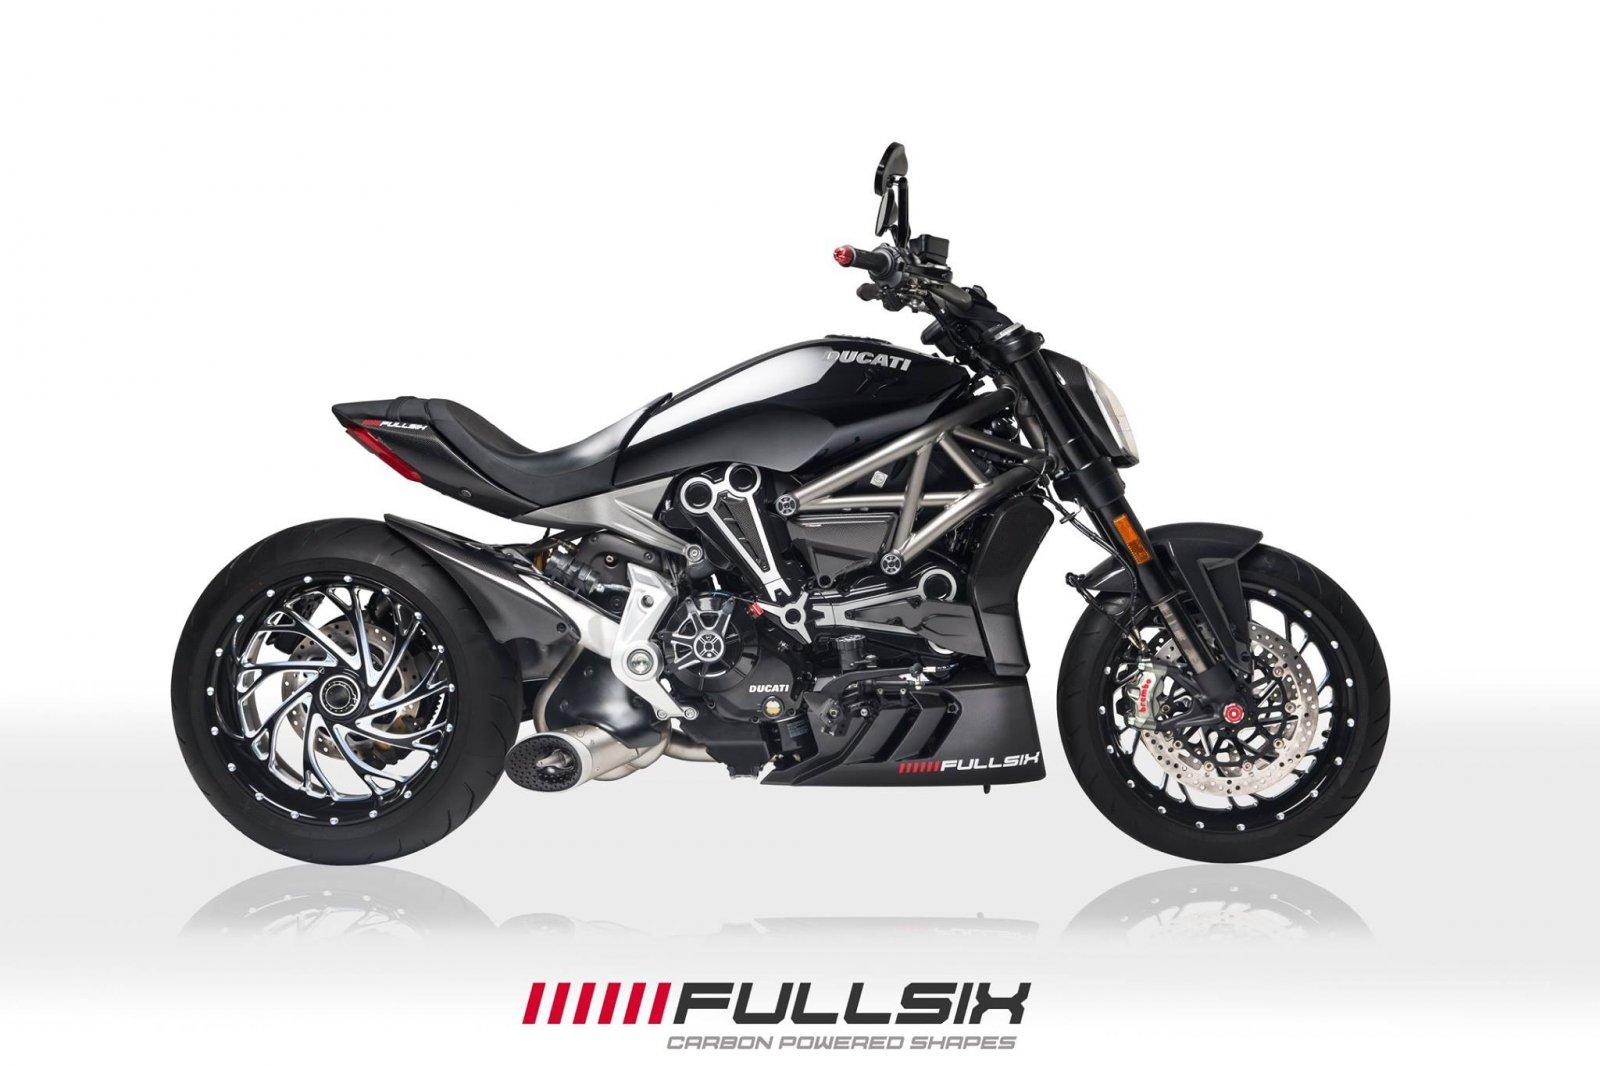 Ducati Xdiavel Carbon Fibre Parts Fullsix Carbon Ducati Forum